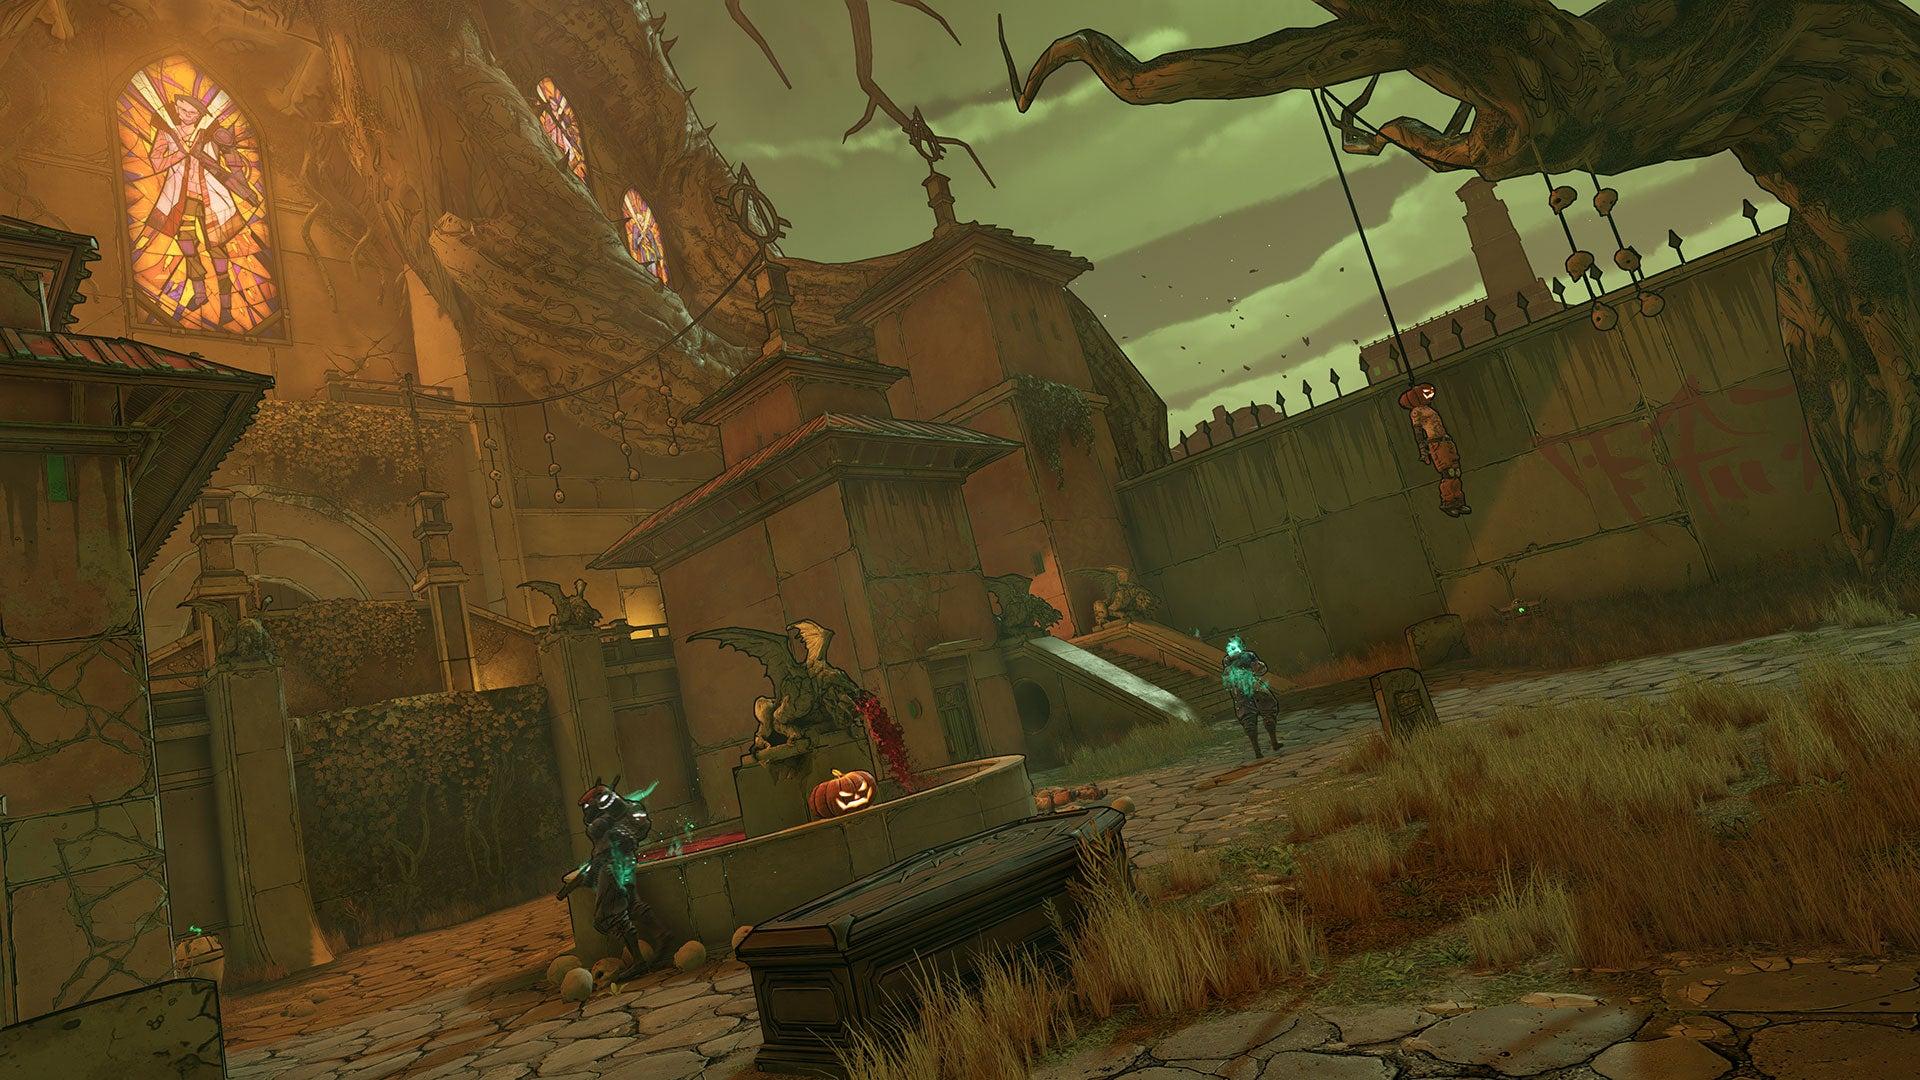 Image for Borderlands 3: Mayhem on Twitch event starts today